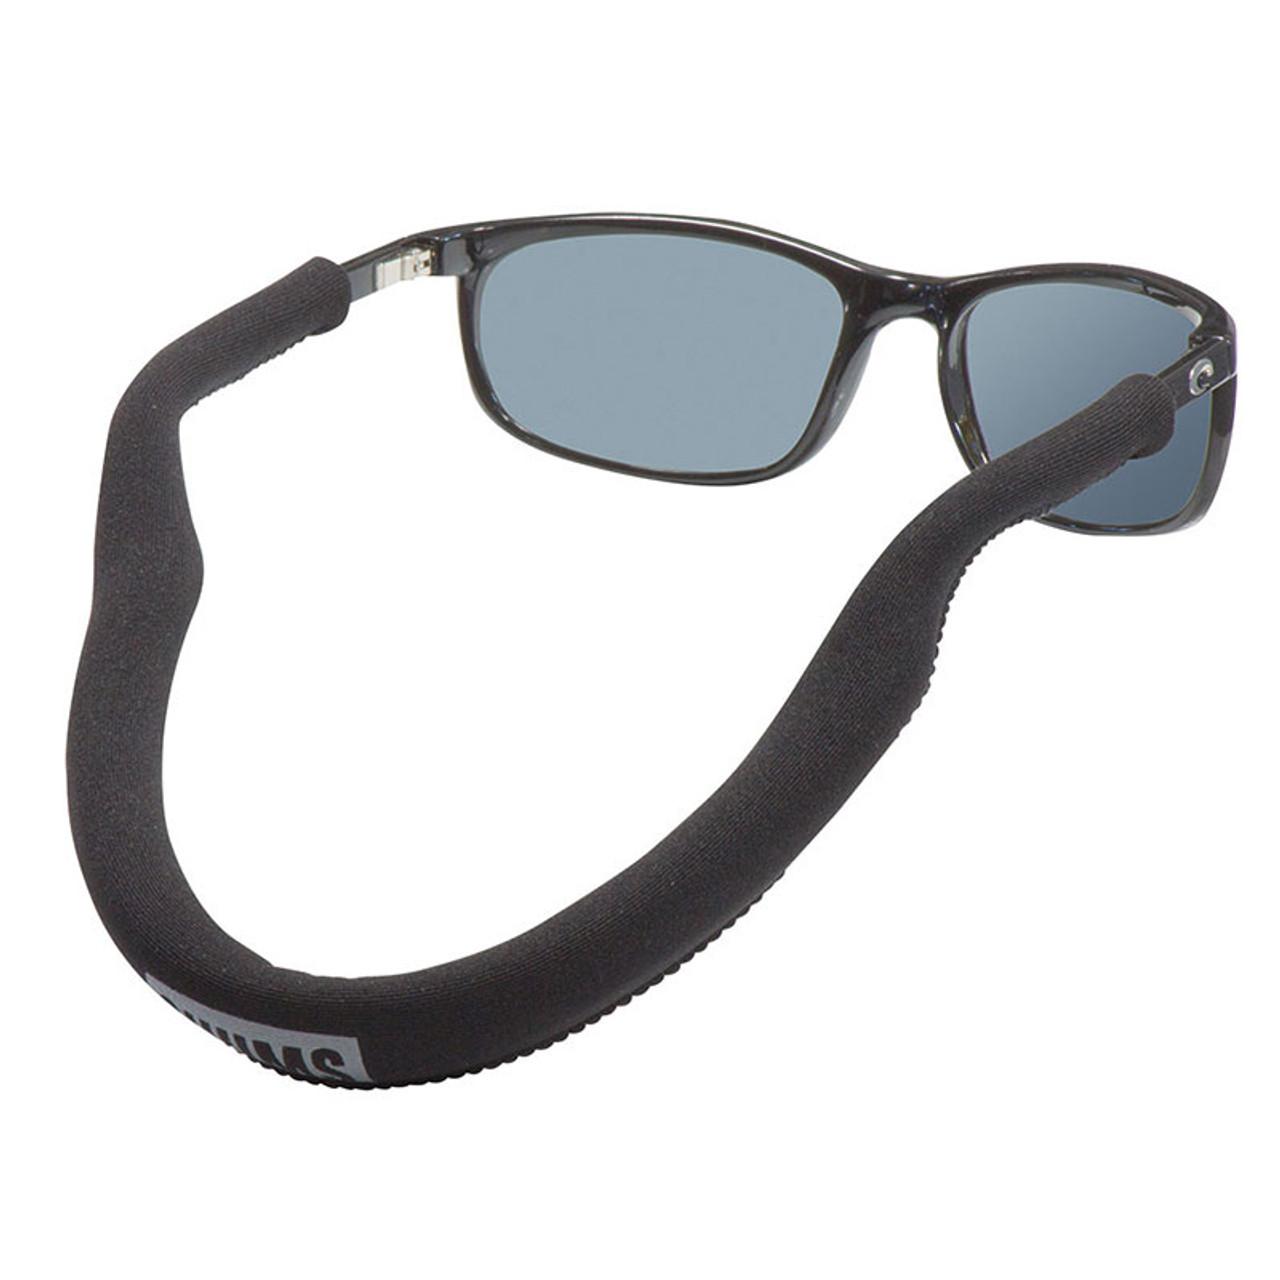 Chums Original Cotton Eyewear Retainer Large End Black Sold Individually